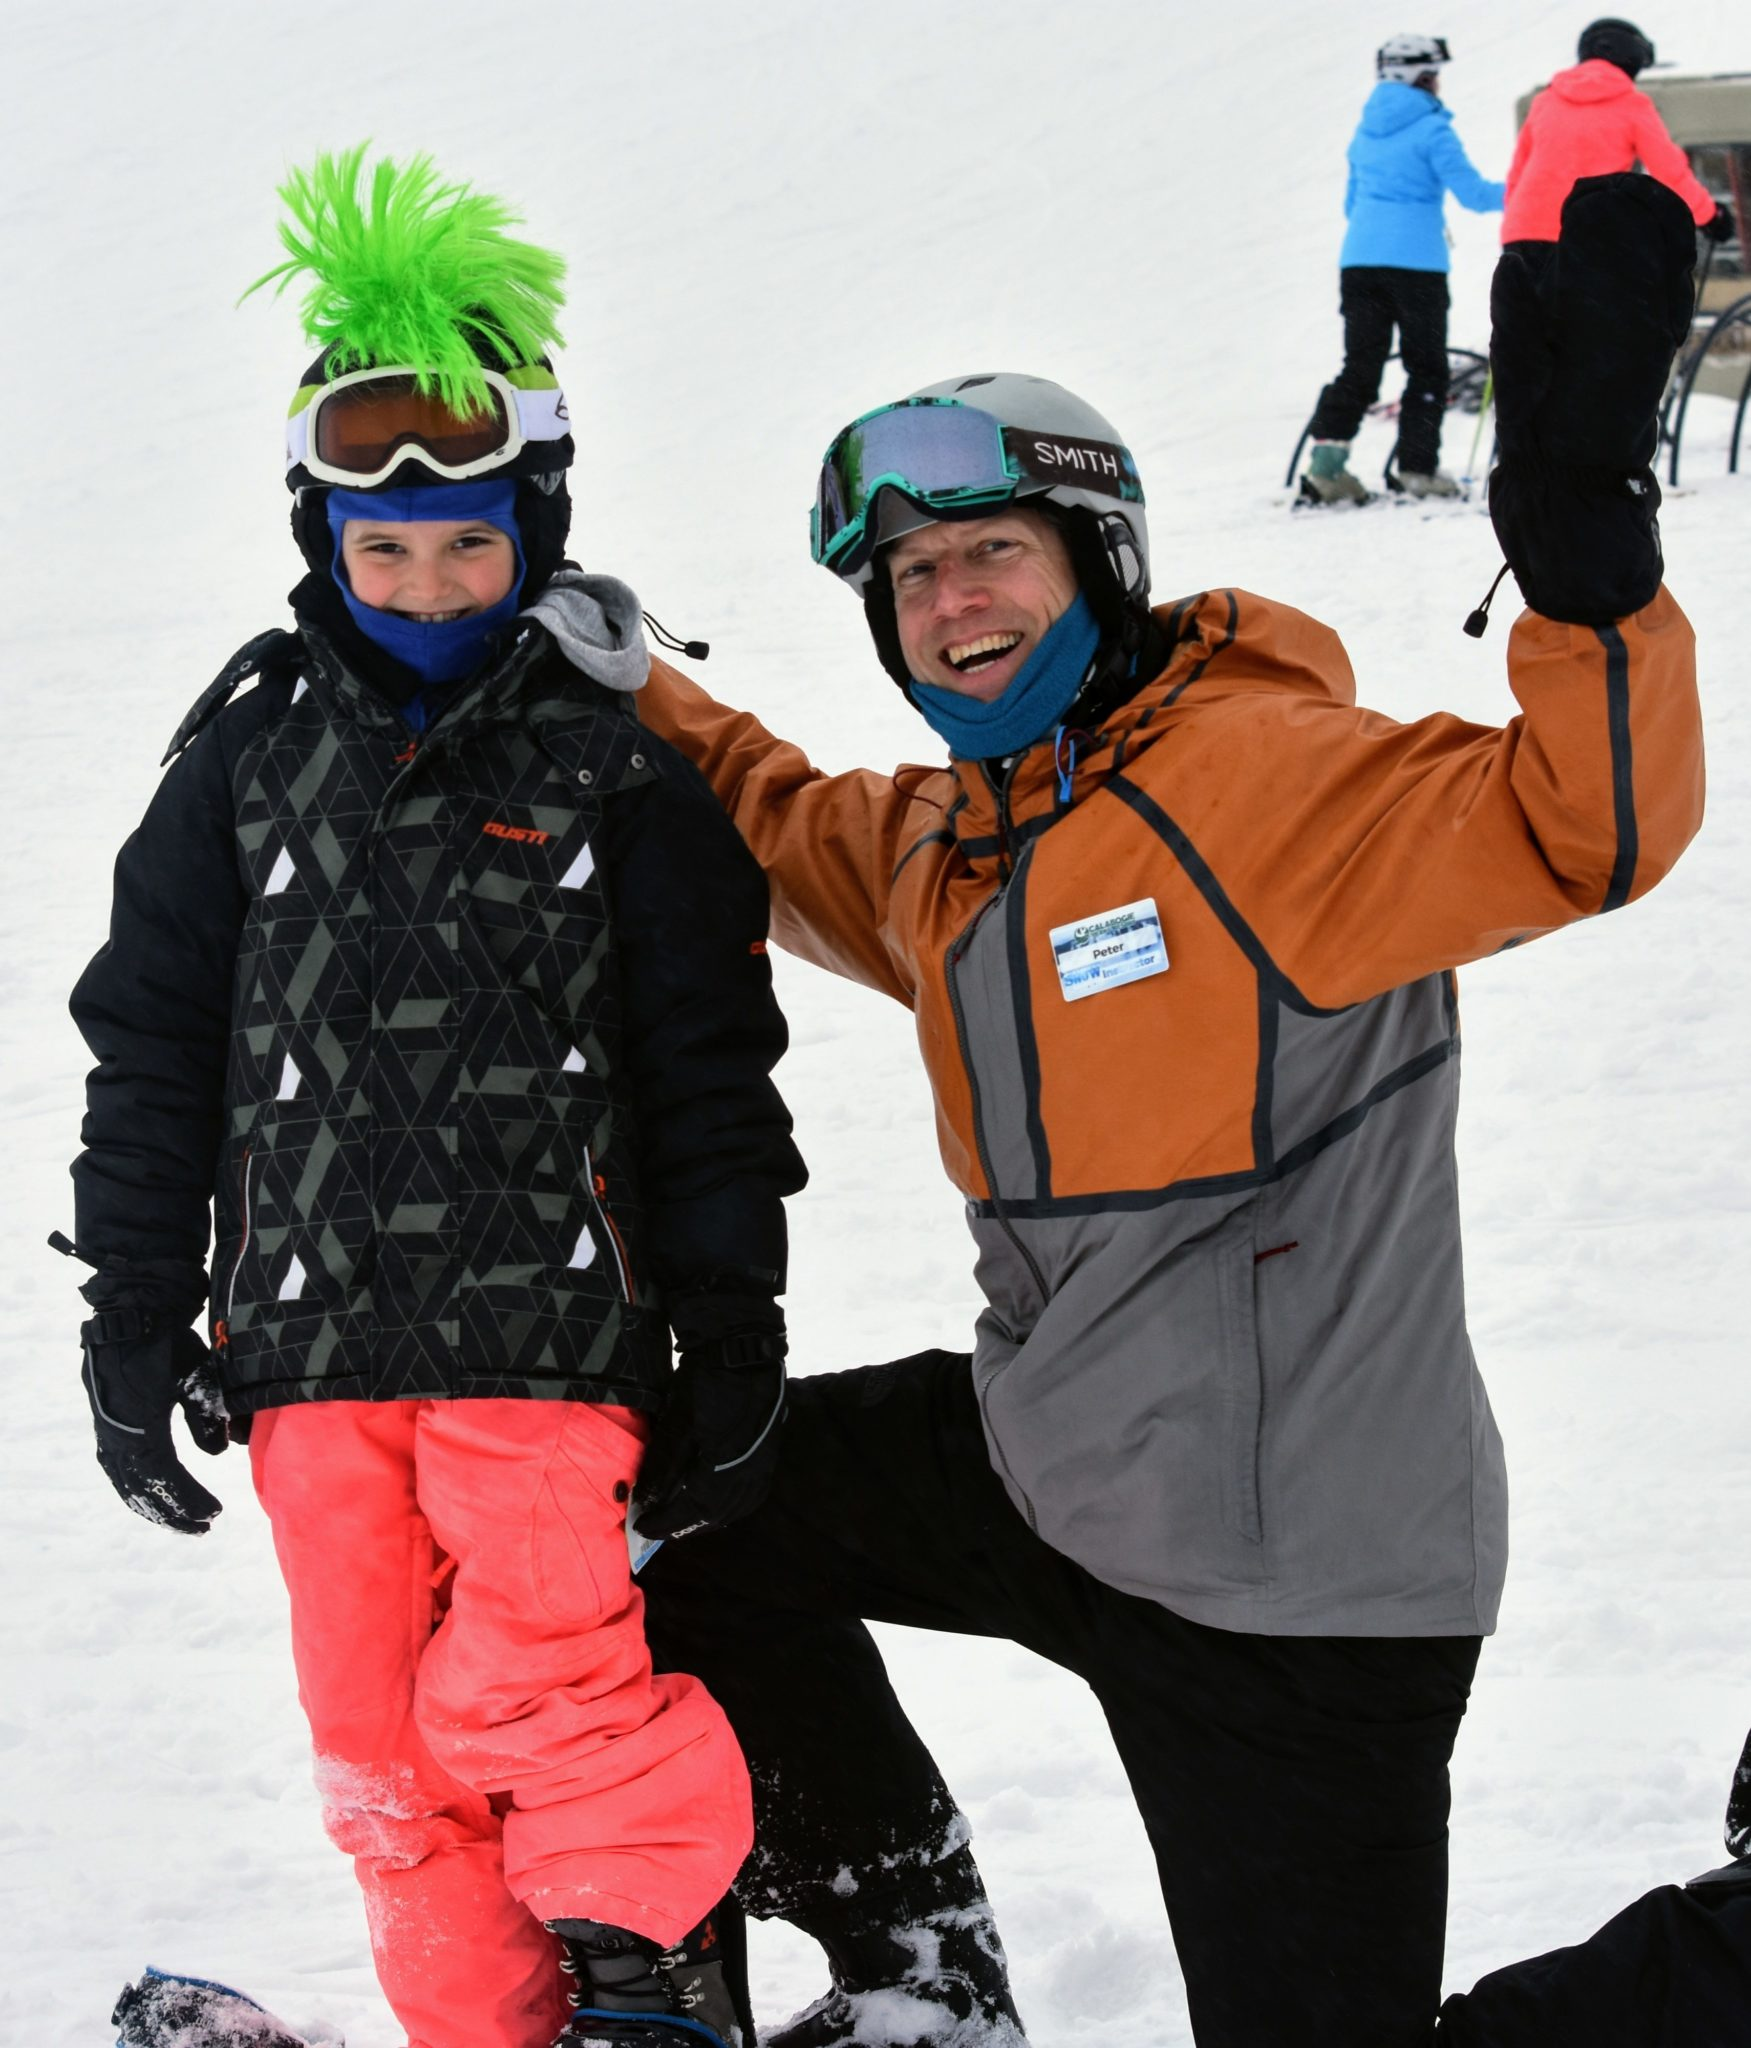 Ski Resort Lessons with snowboard and ski instructor near Ottawa